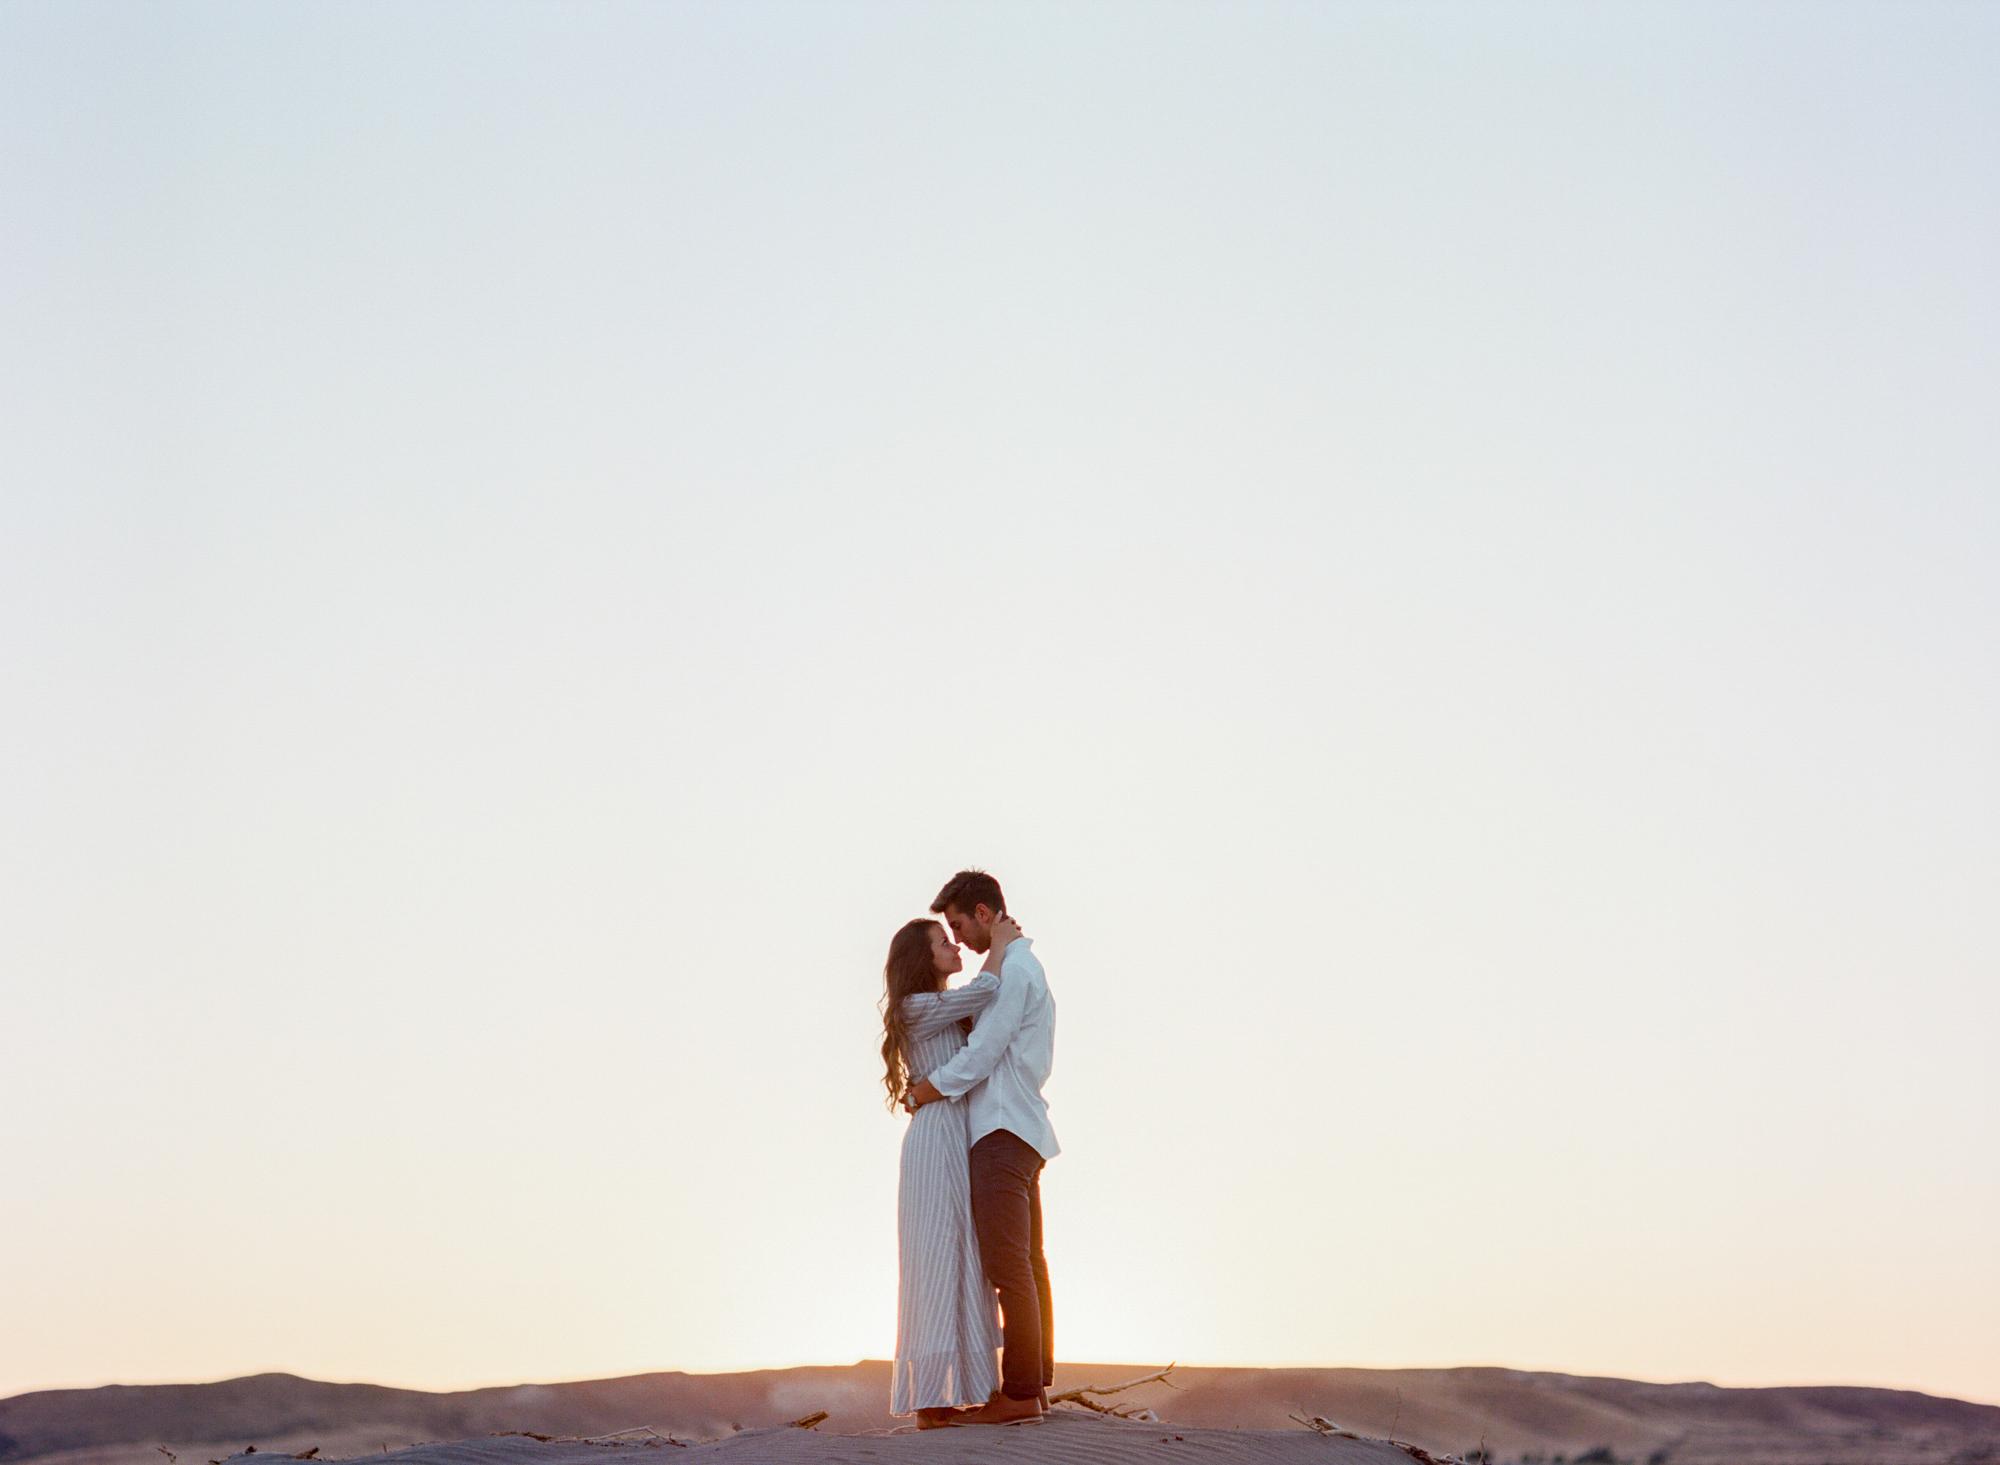 charlotte-charleston-wedding-family-film-destination-photographer-bruneau-sand-dunes-boise-idaho-23.jpg